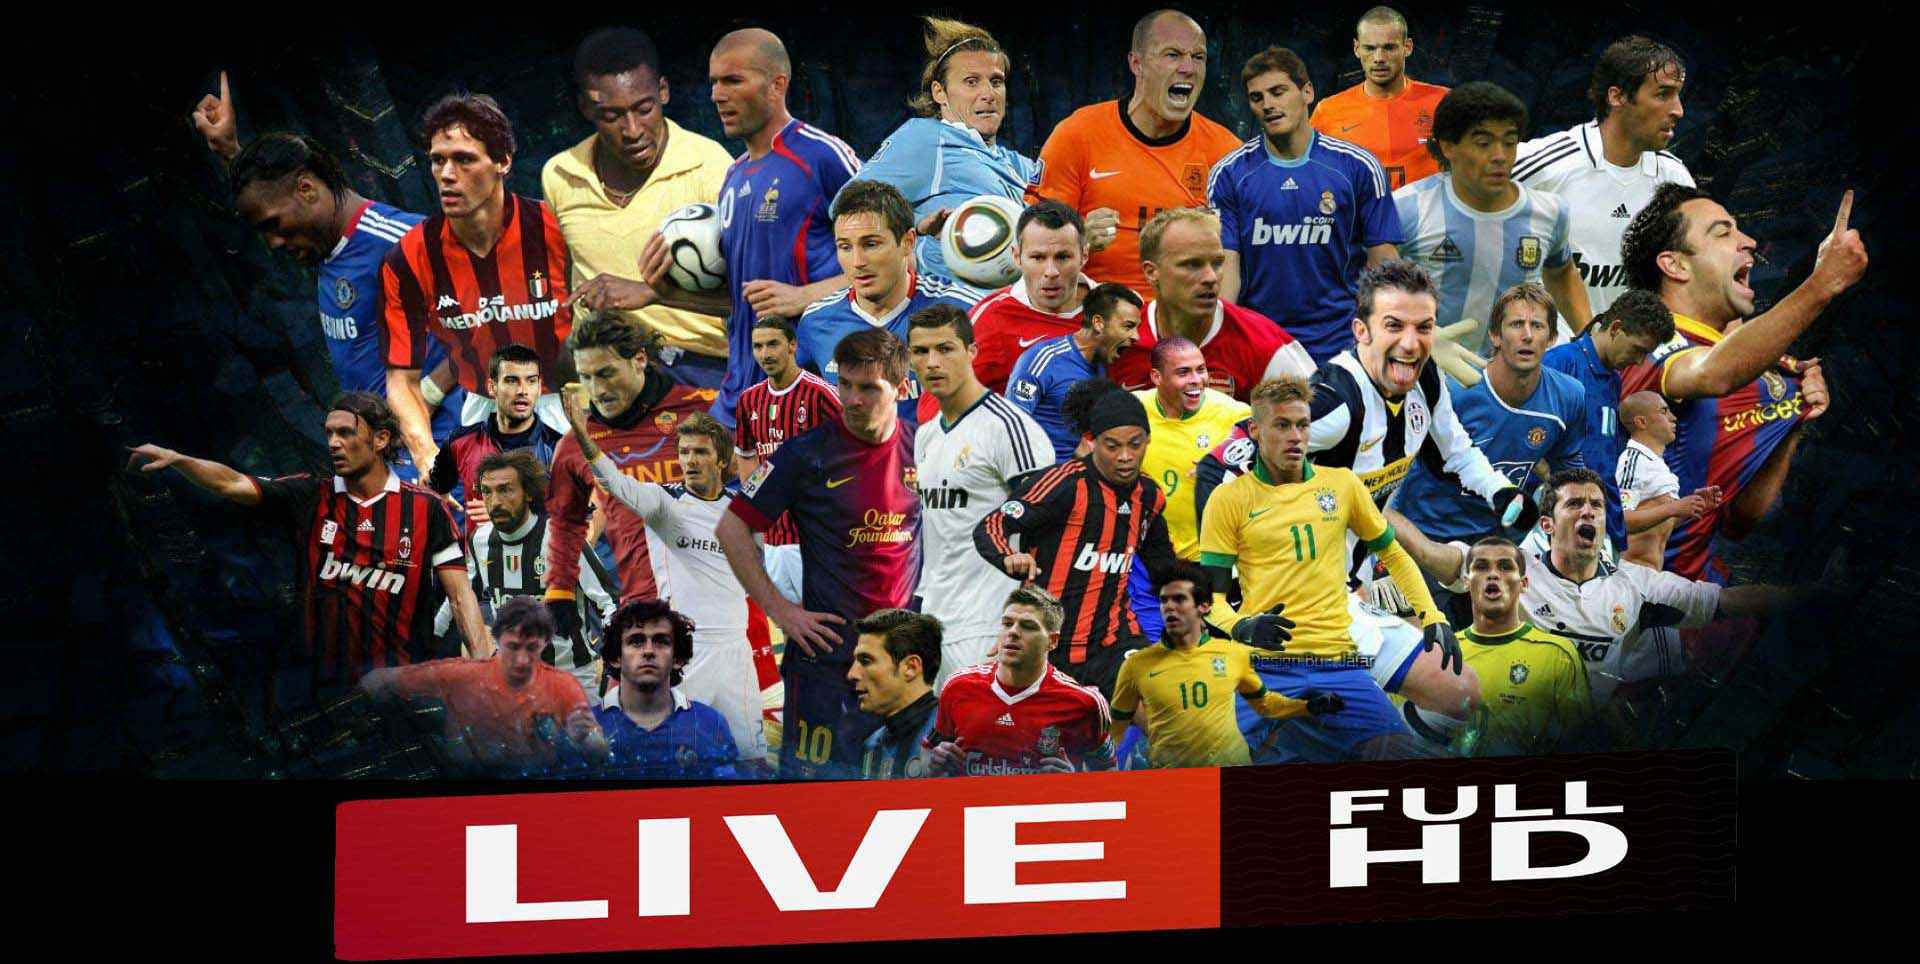 Watch Besiktas vs Napoli UEFA Live